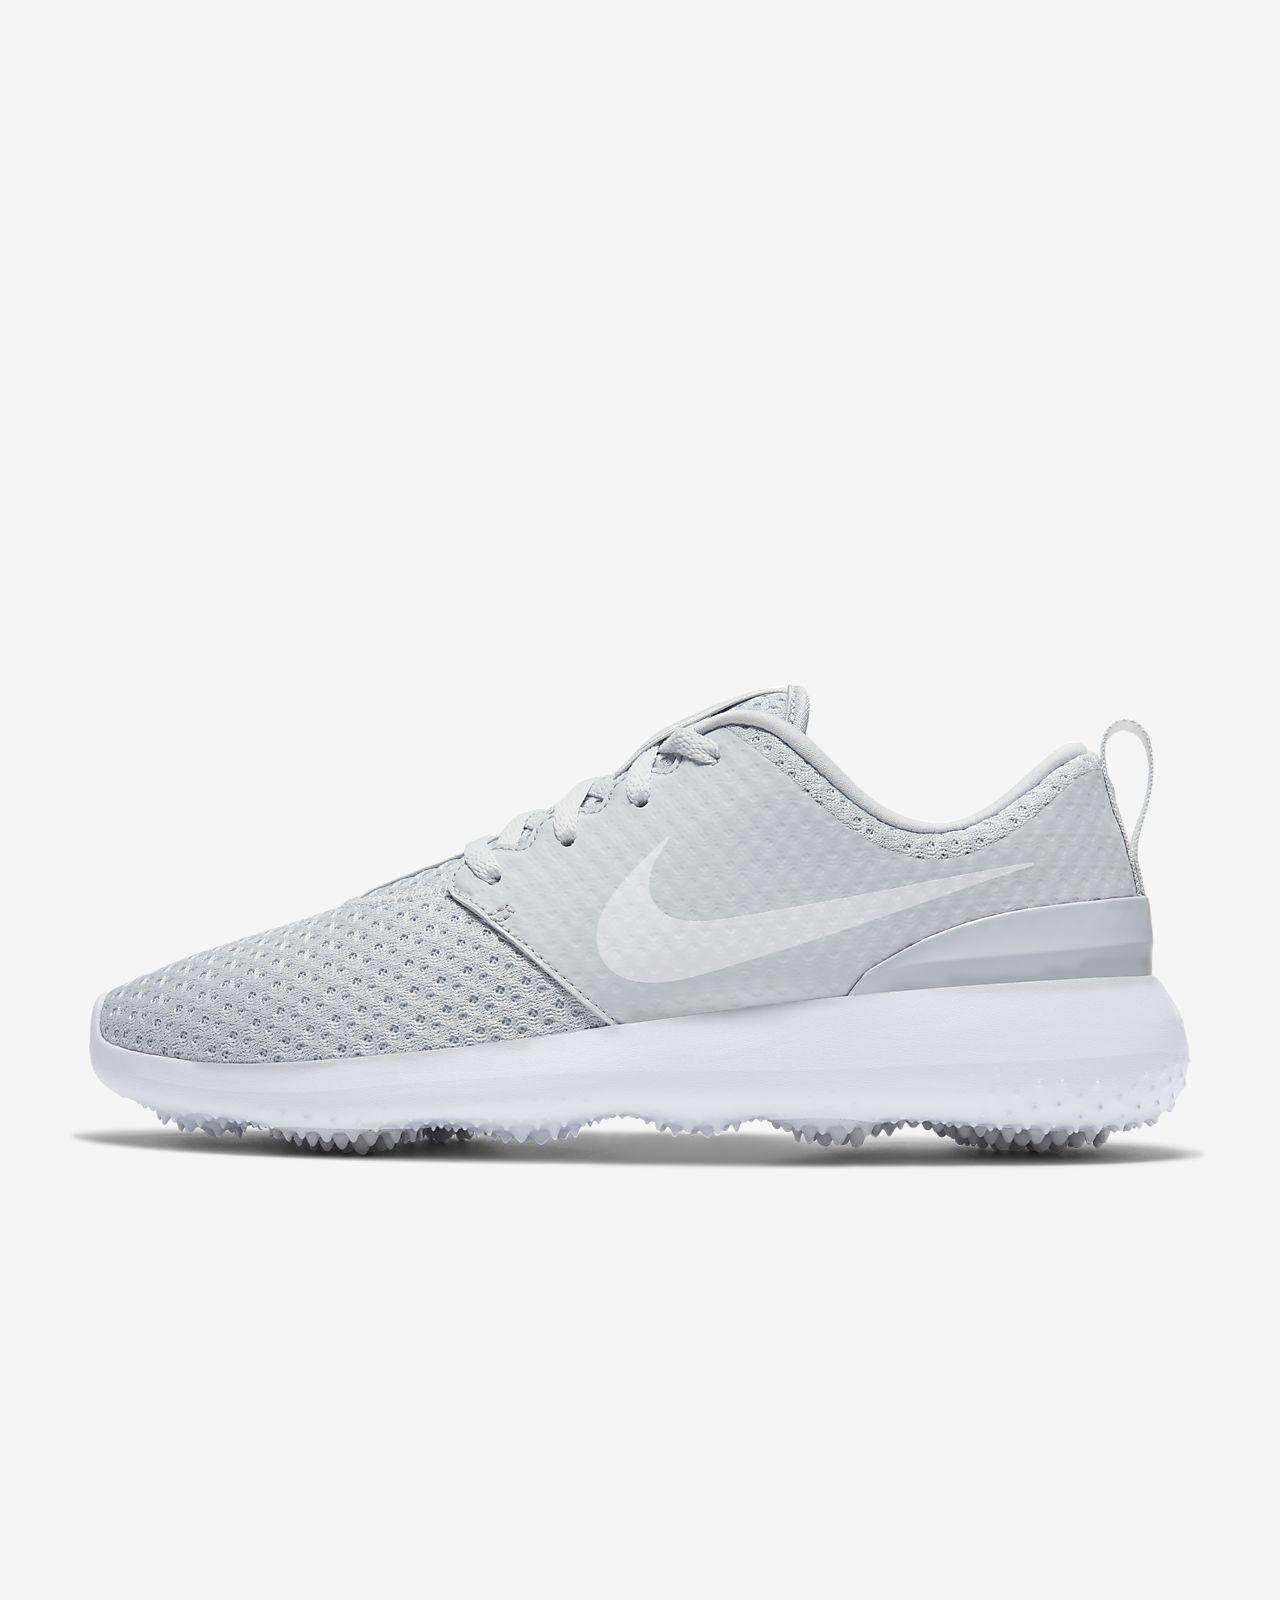 buy online sale usa online reasonable price Chaussure de golf Nike Roshe G pour Femme. Nike CA